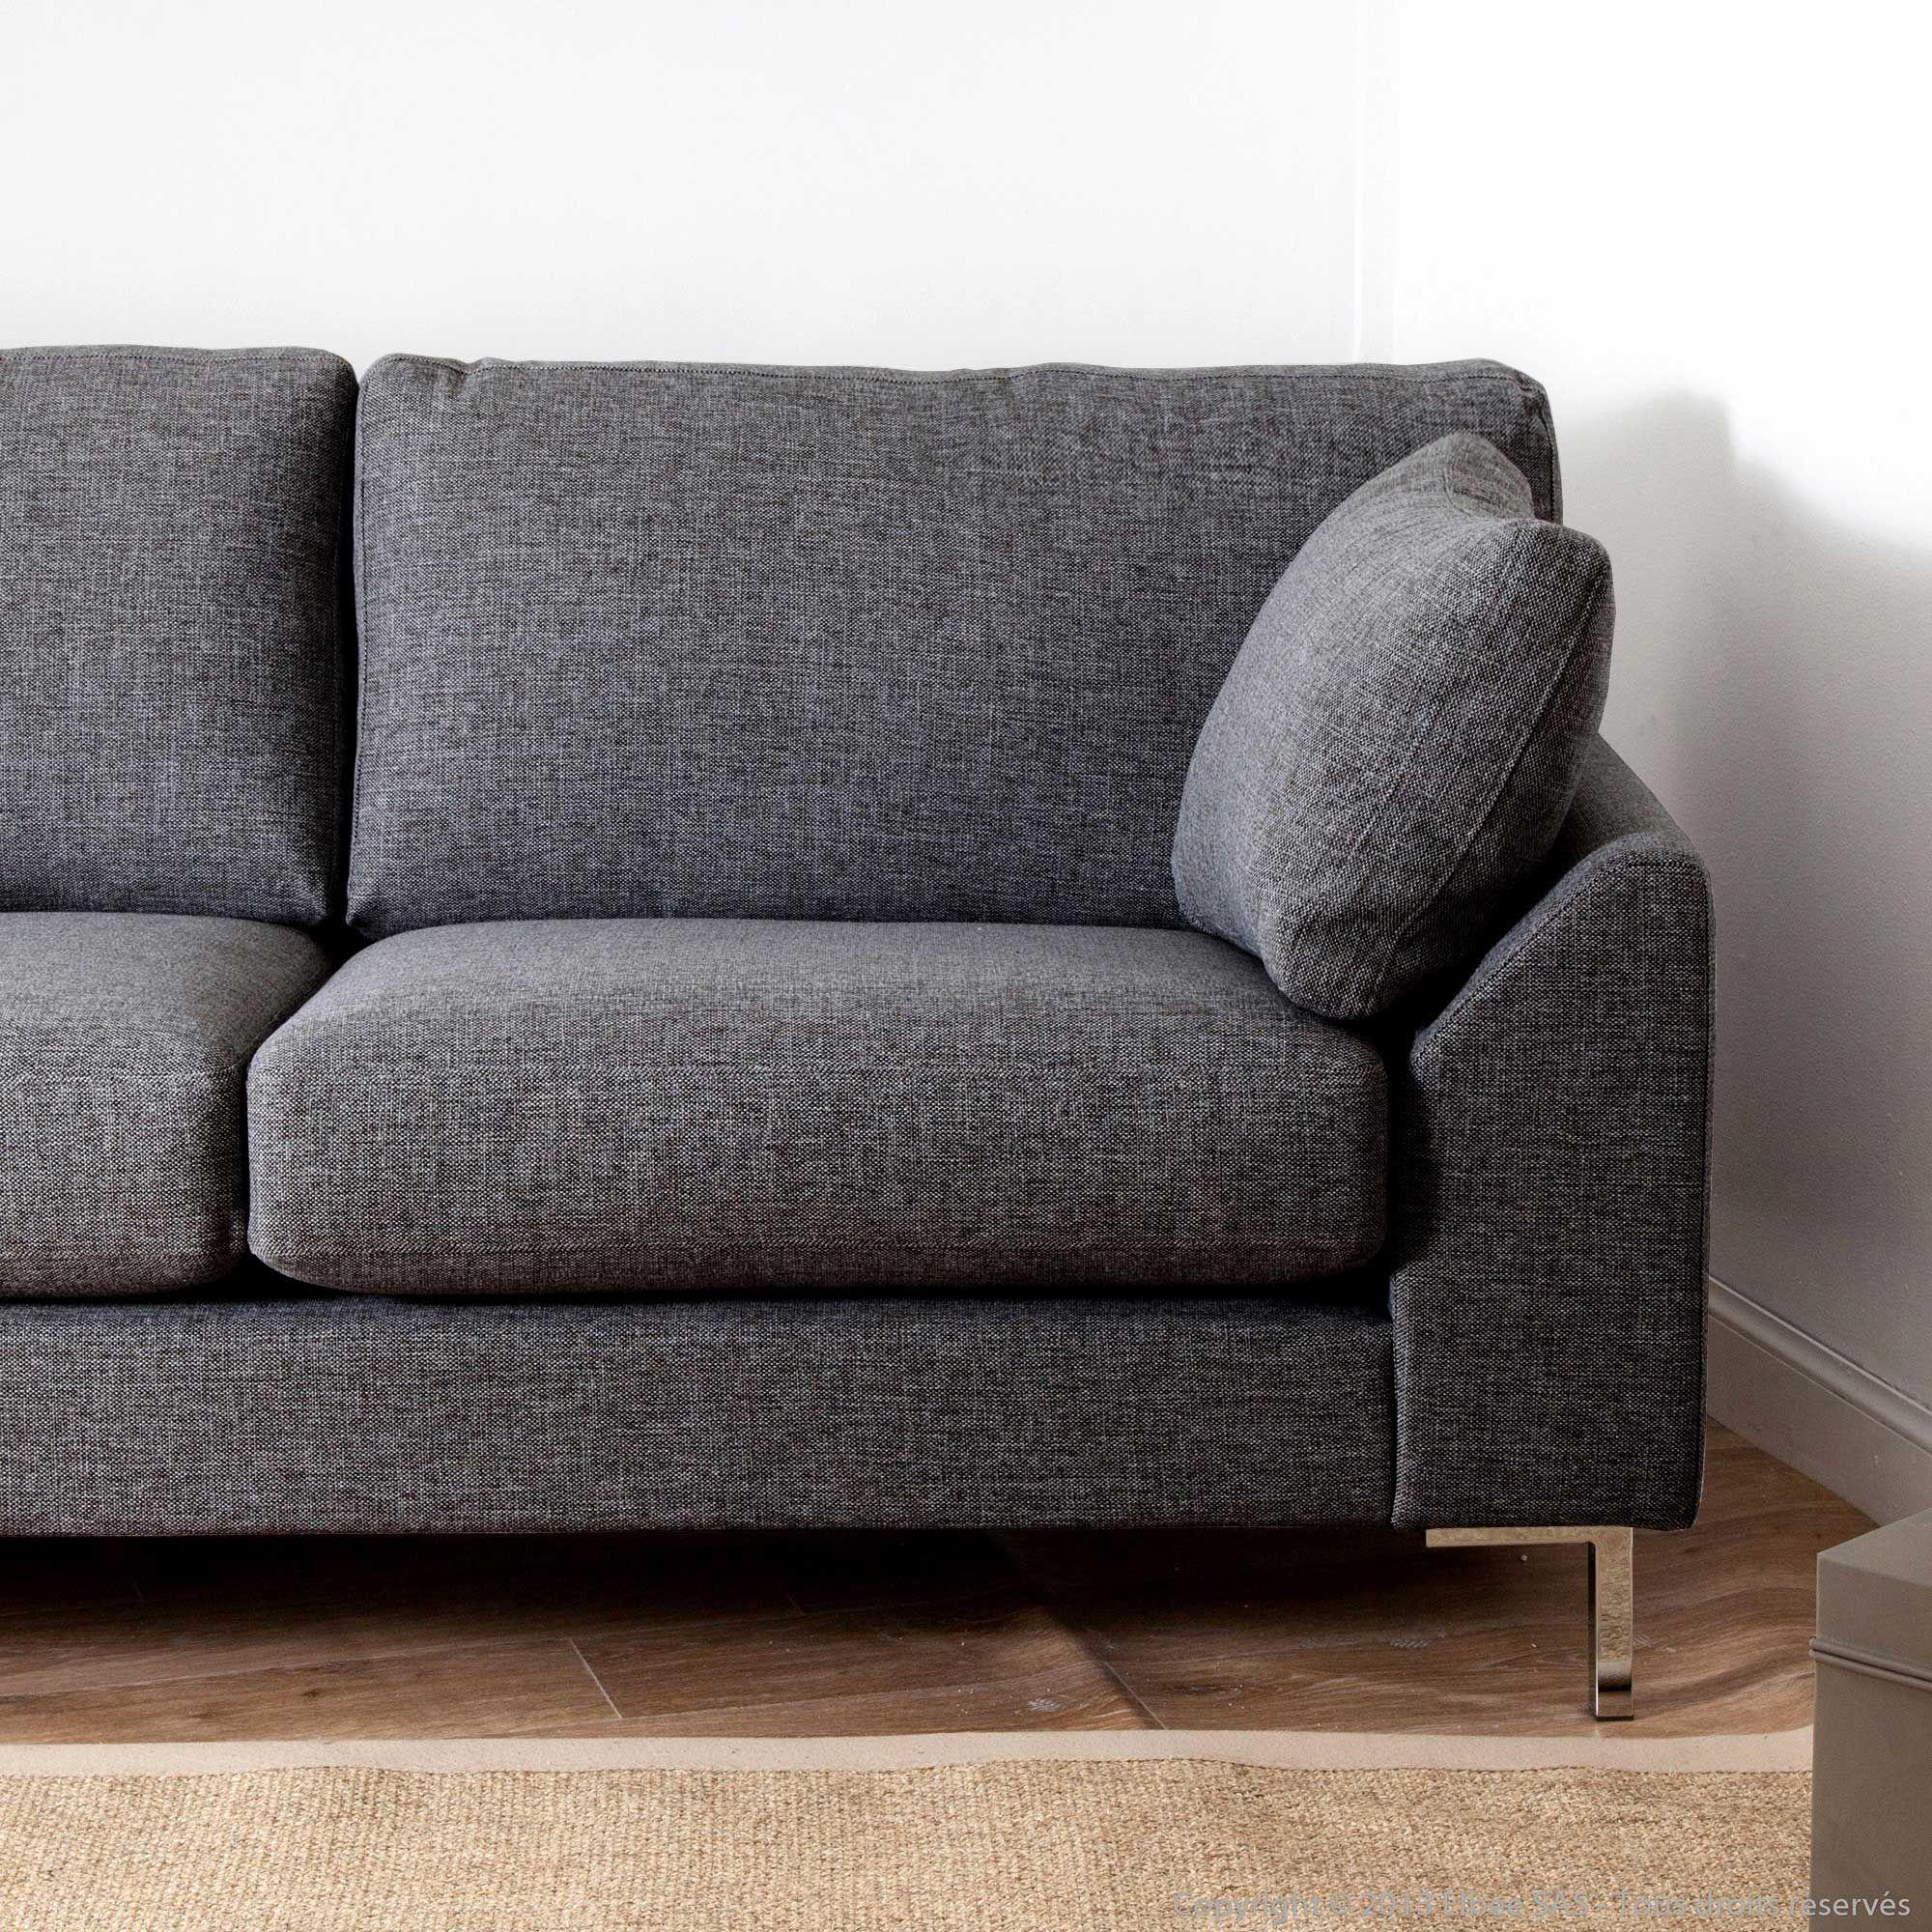 Canape D Angle Design Tissu Nouveau Canape Meri Nne Cuir Maison